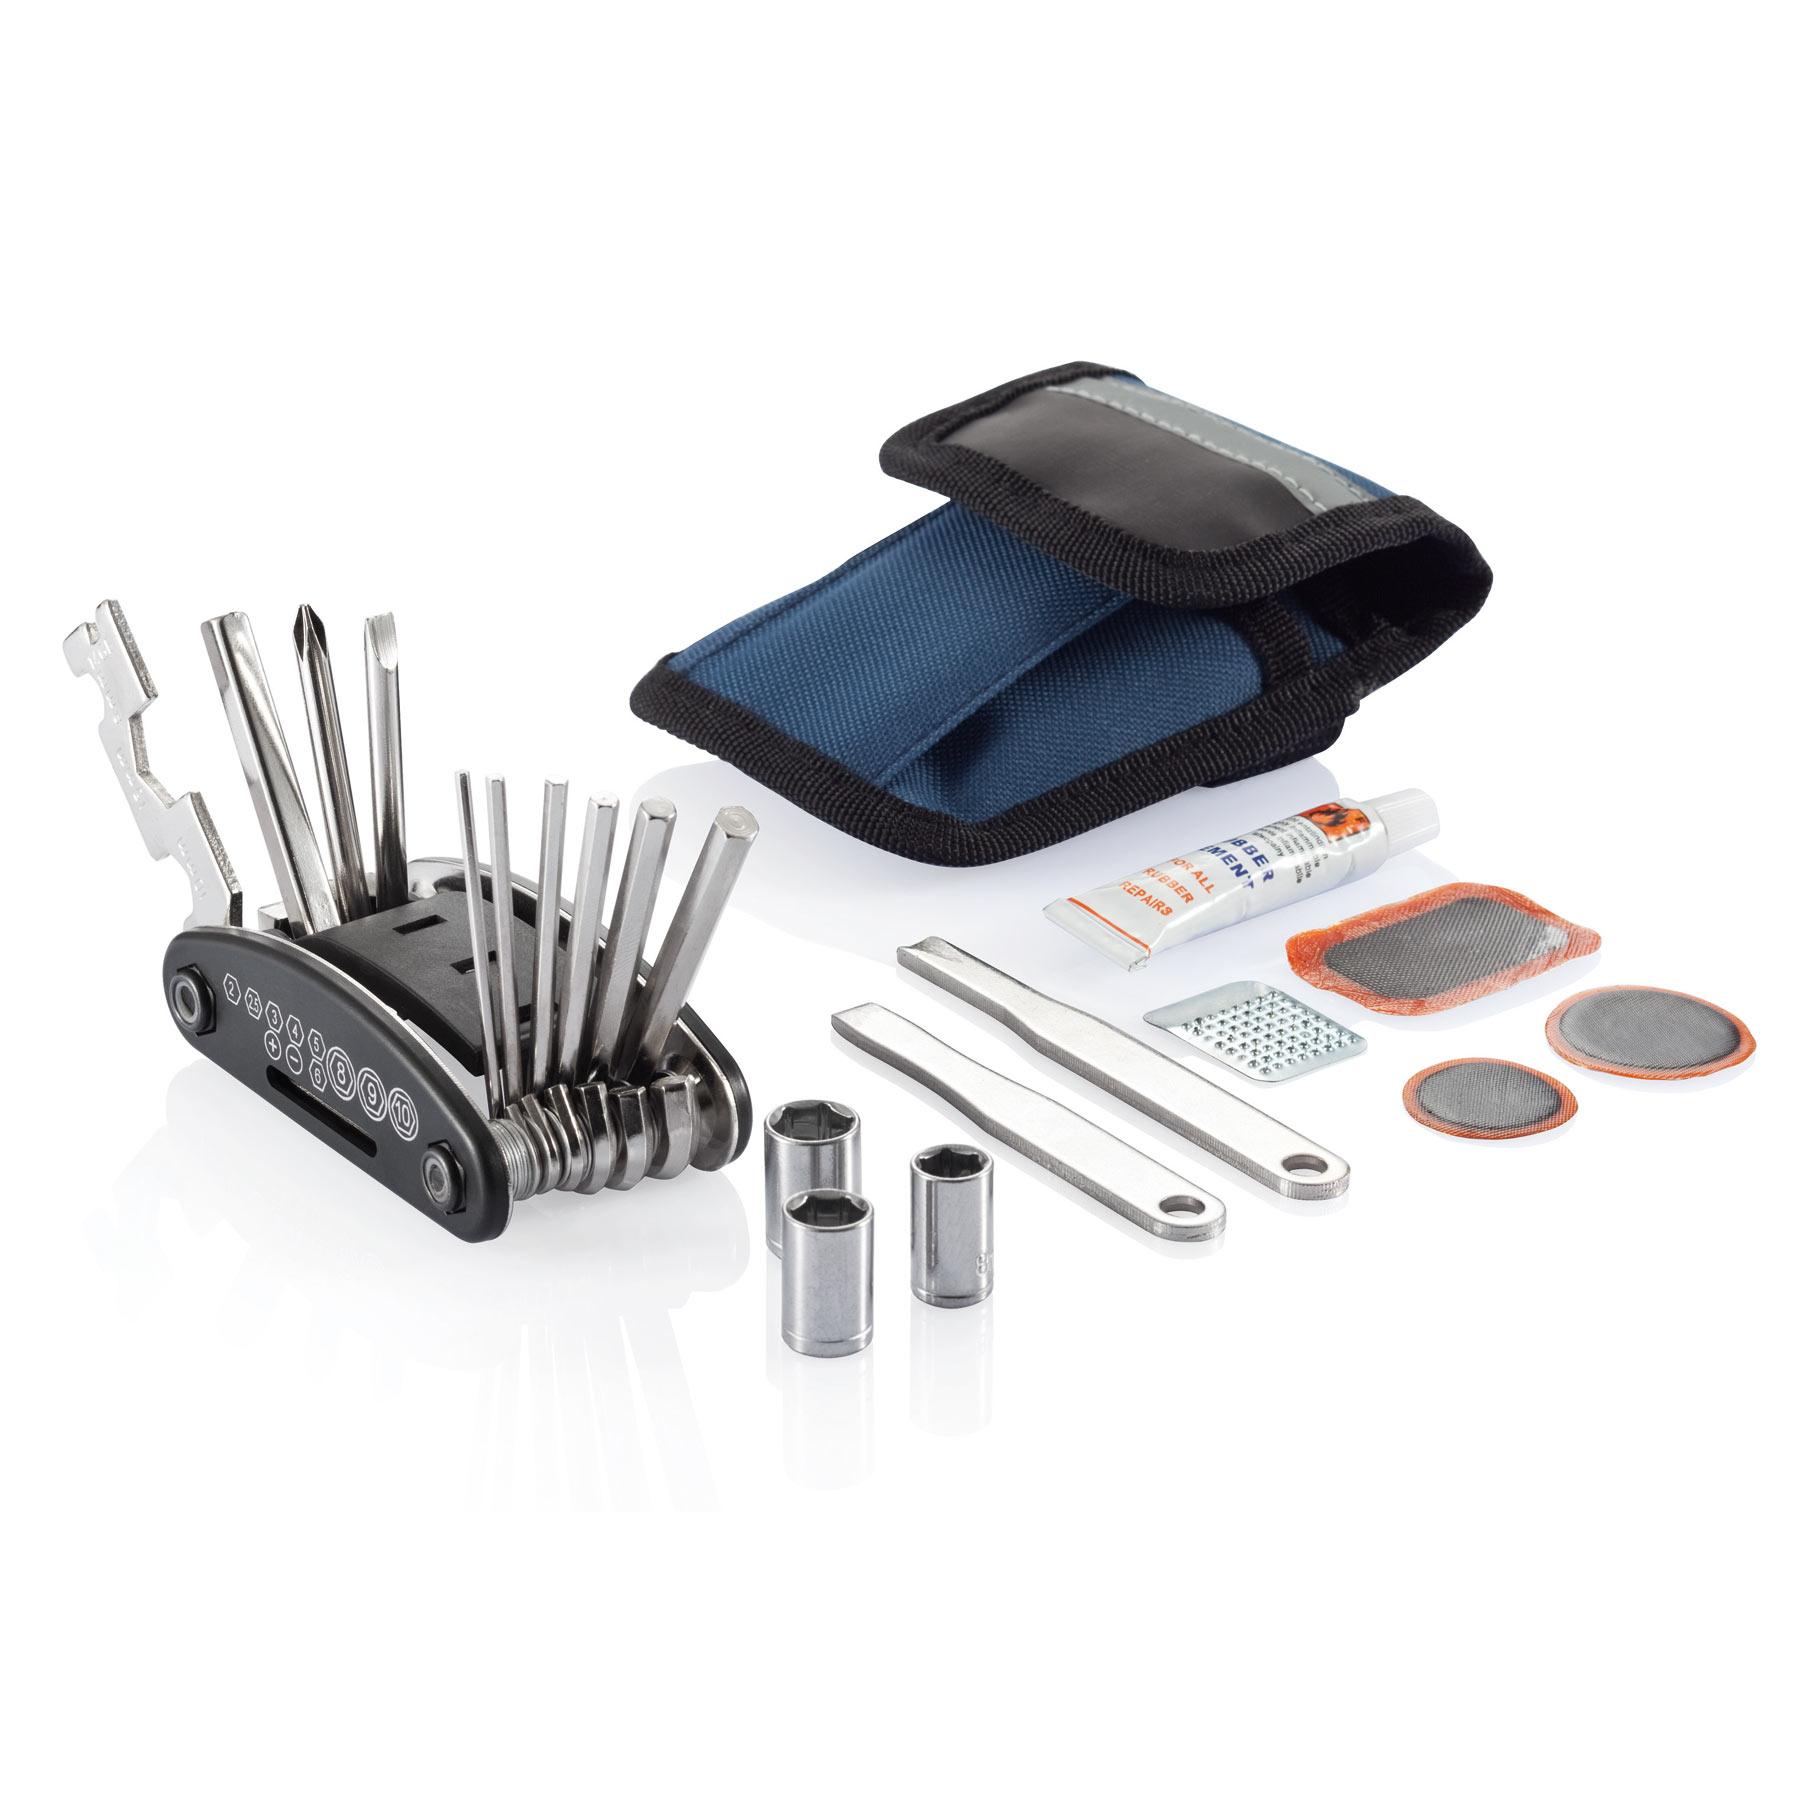 kit reparation velo publicitaire outils multifonctions a. Black Bedroom Furniture Sets. Home Design Ideas